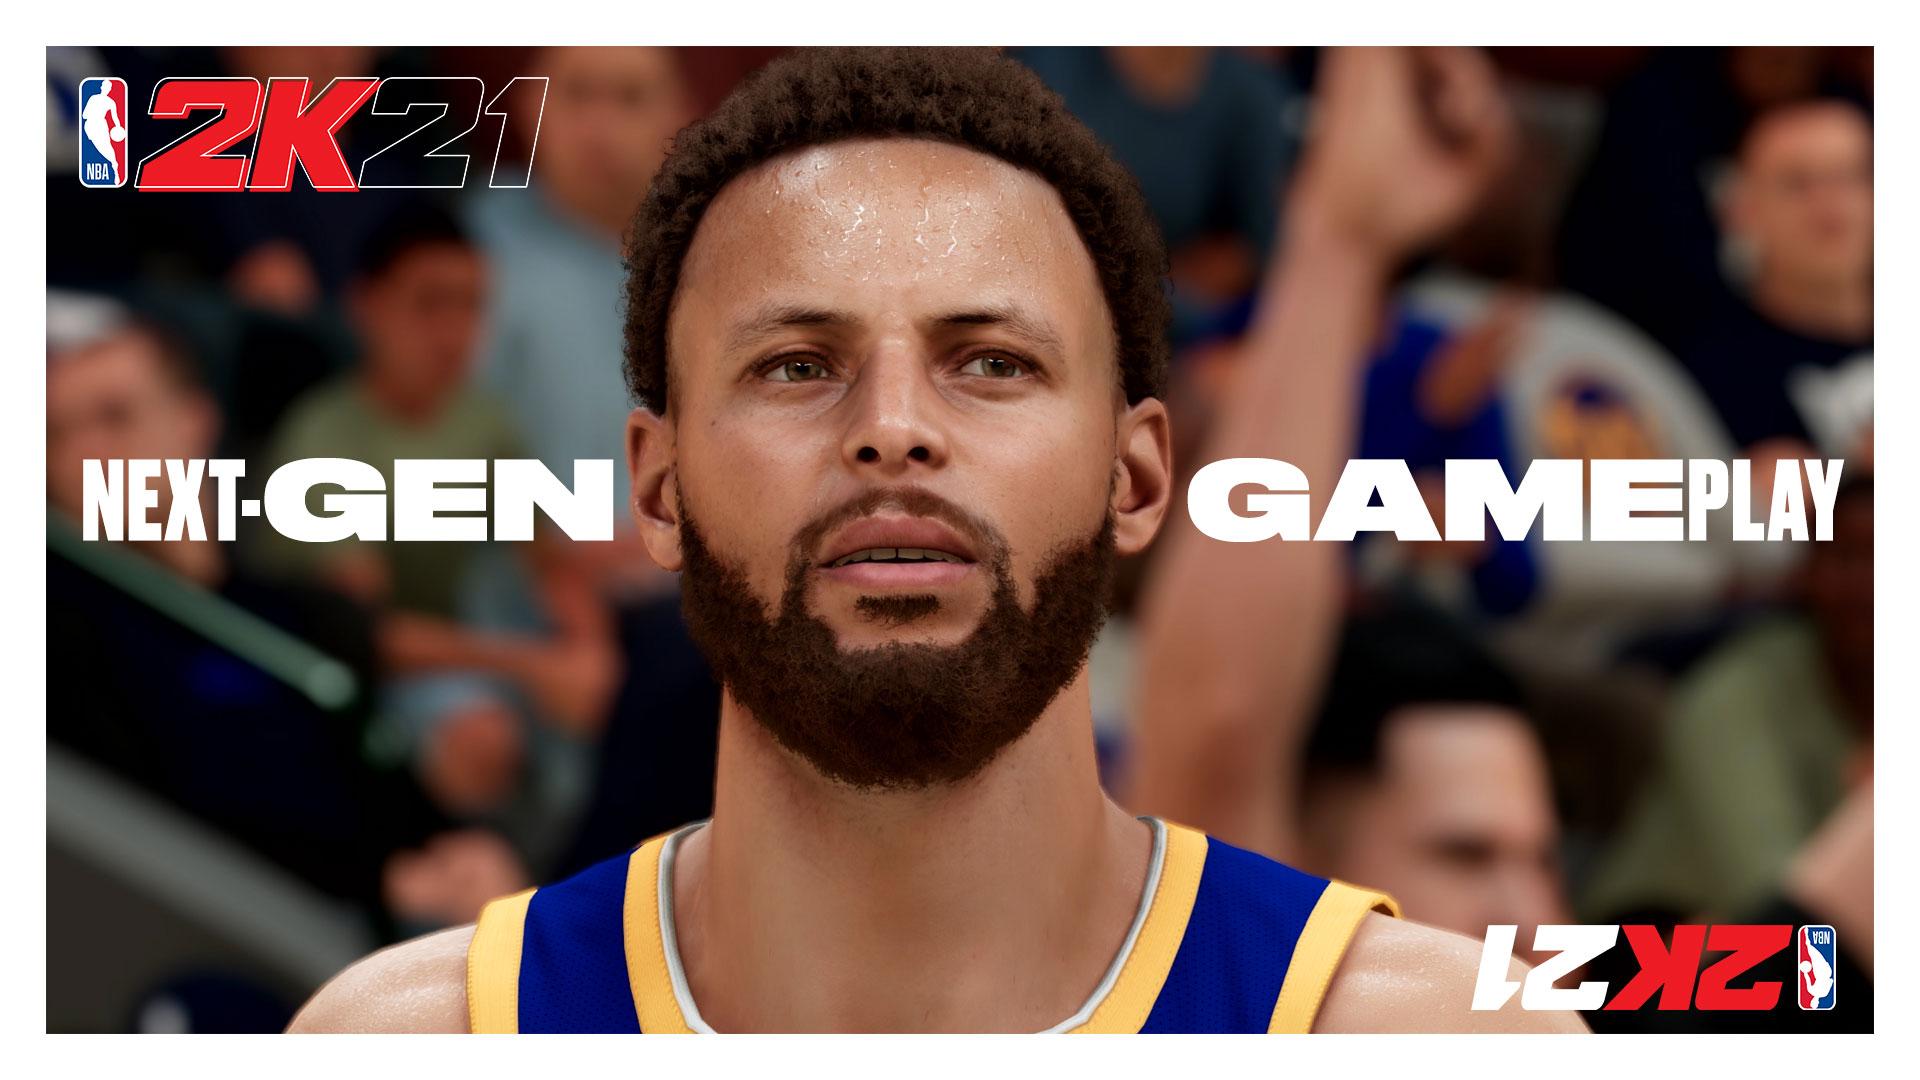 'NBA 2K21' Next-Gen Has A New Rail Cam Presentation & More